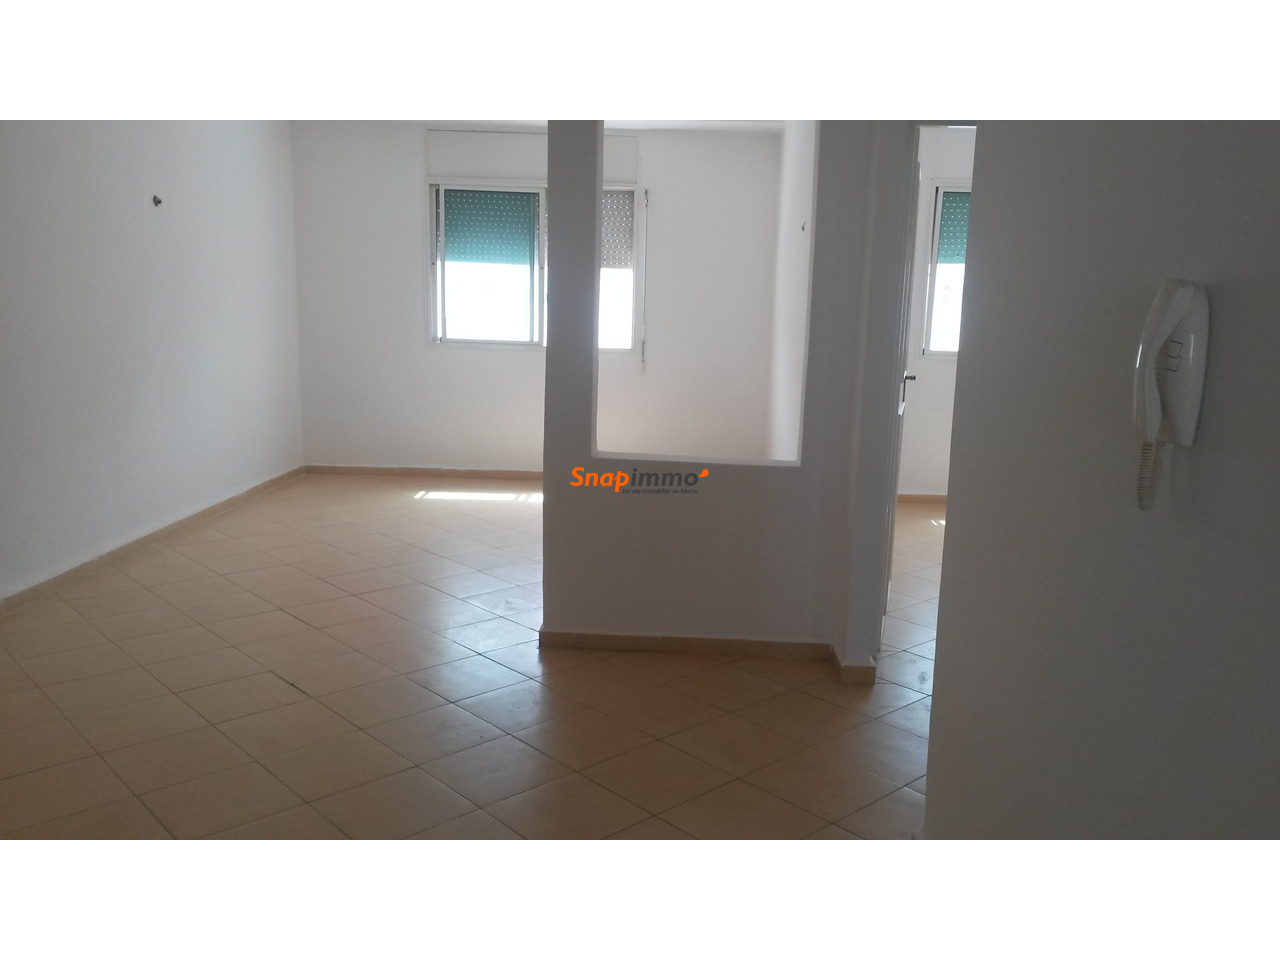 appartement 60 m2 avec deux fa ades tanger. Black Bedroom Furniture Sets. Home Design Ideas